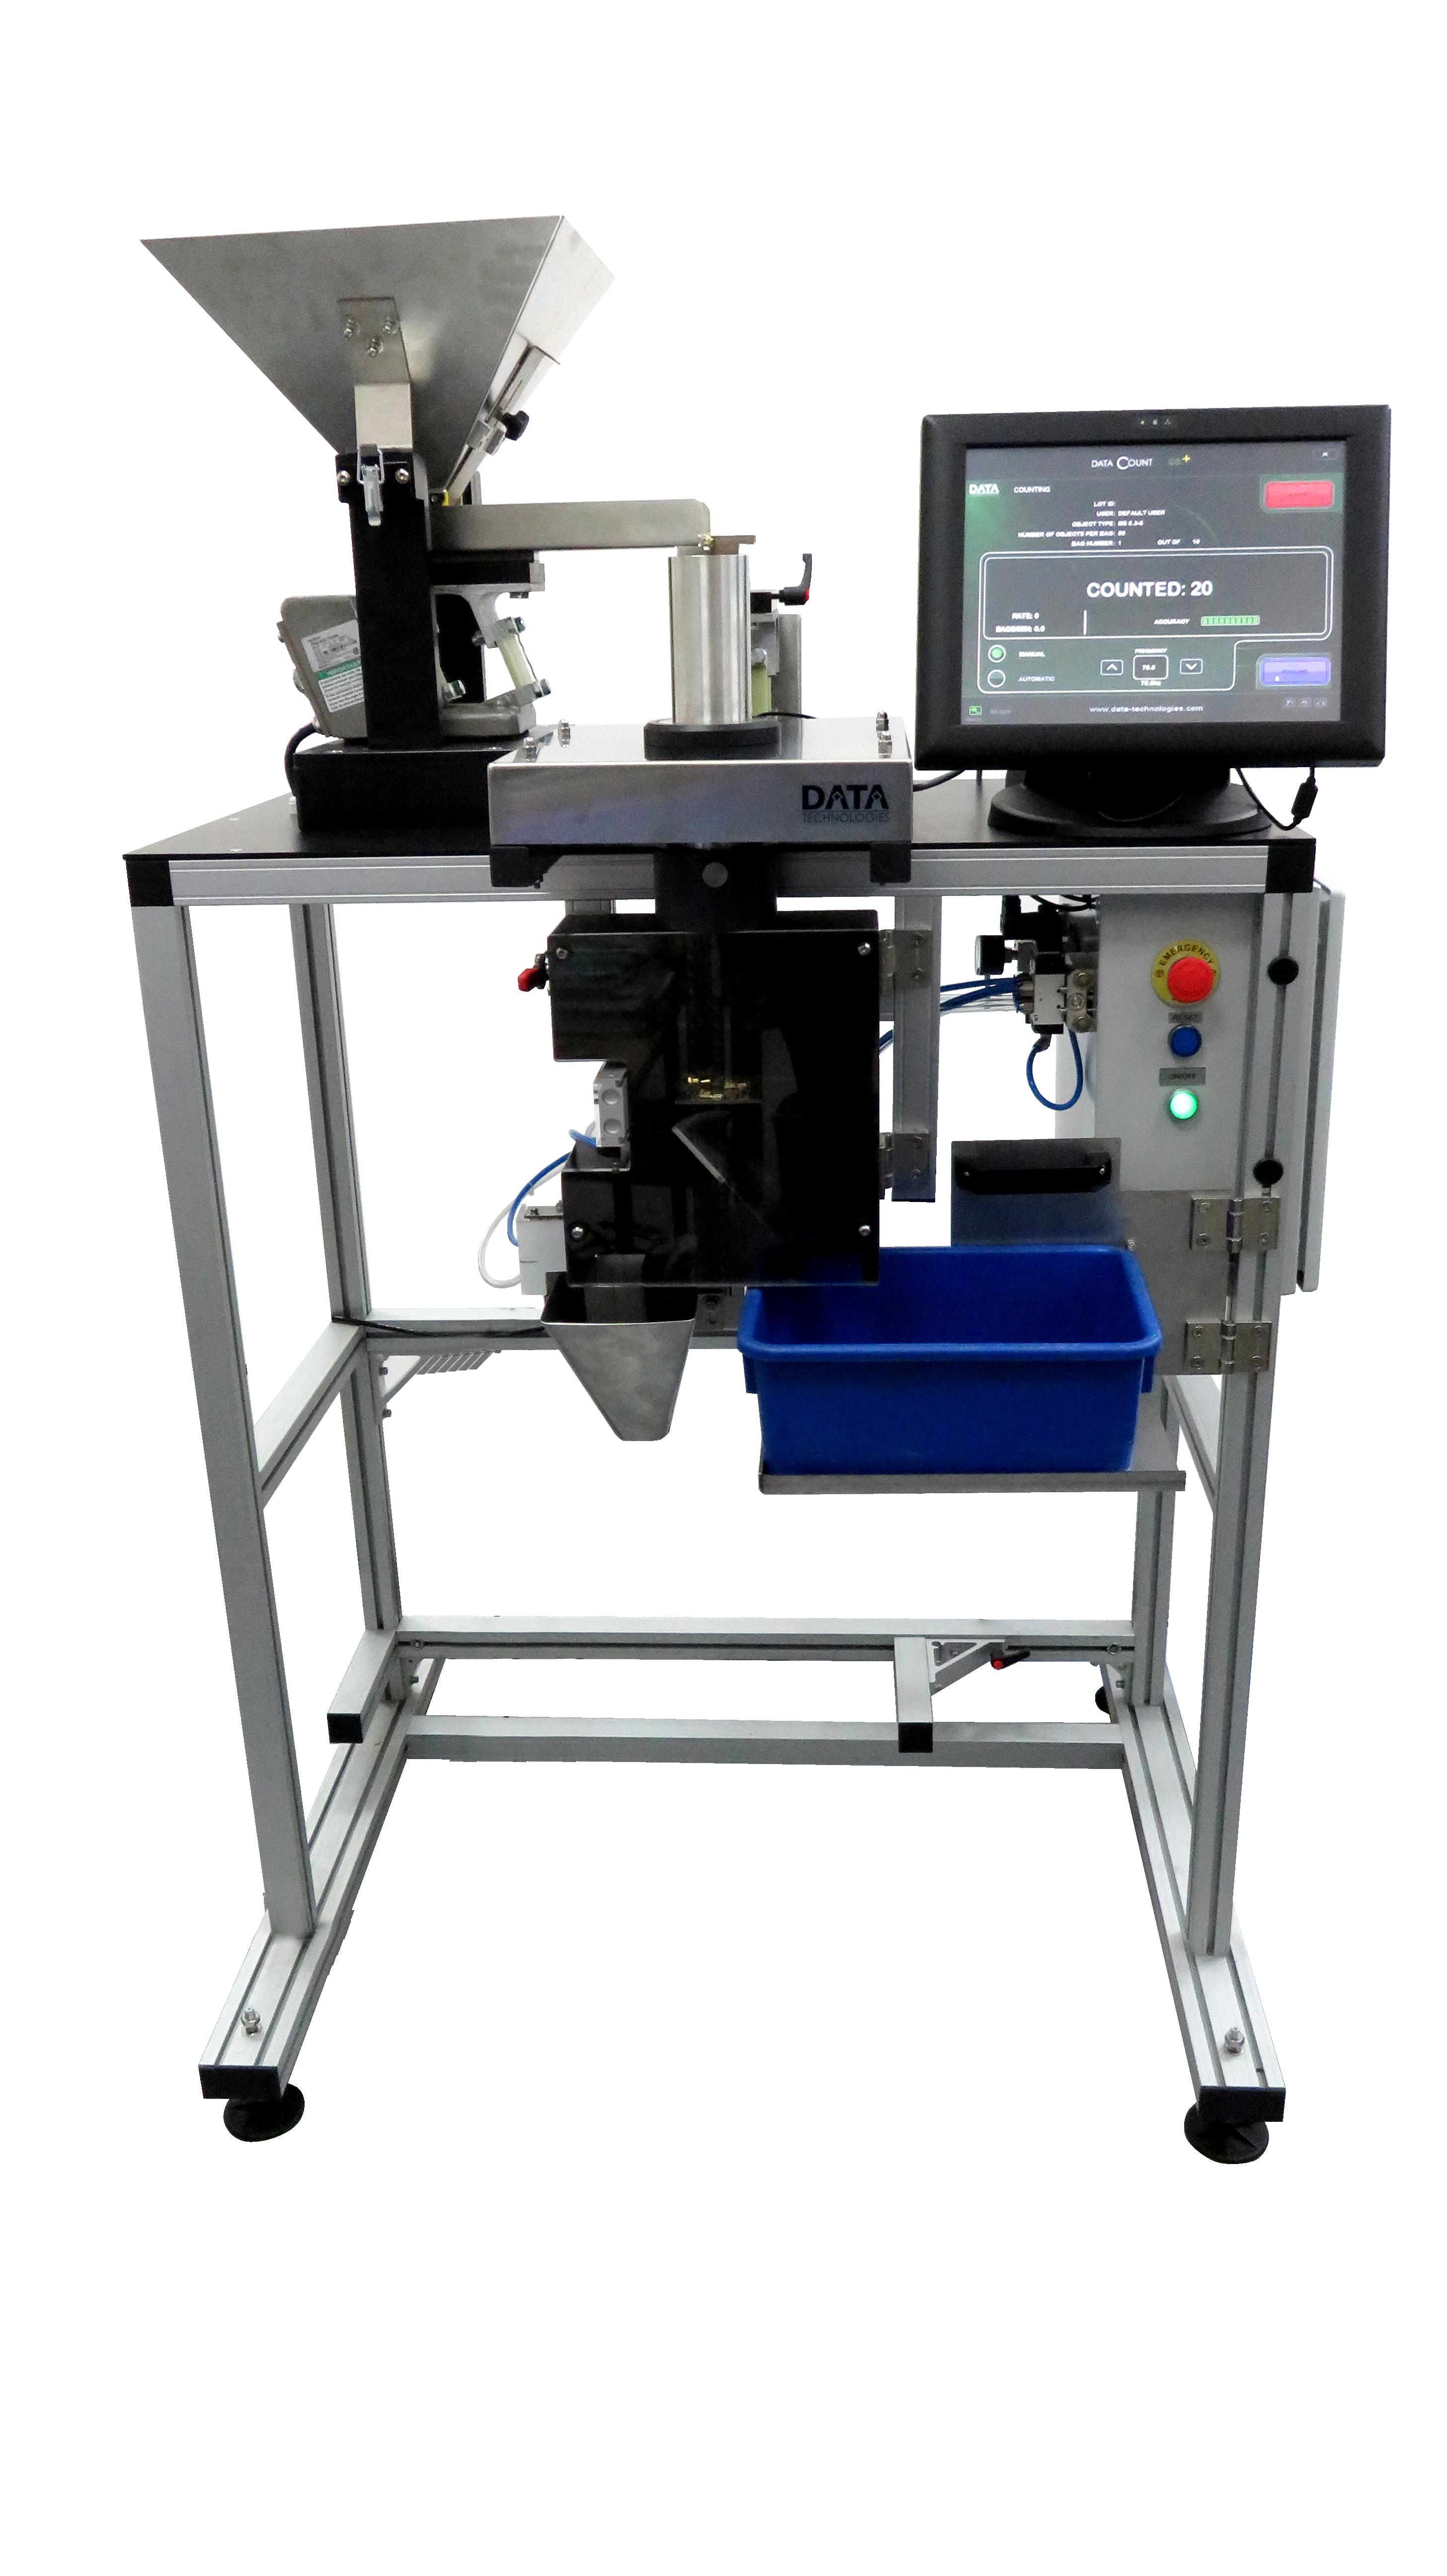 Data Technologies U162 Counter With Aps Ps 125 Partsofcircuitbreakerbmp Ps125 Machine